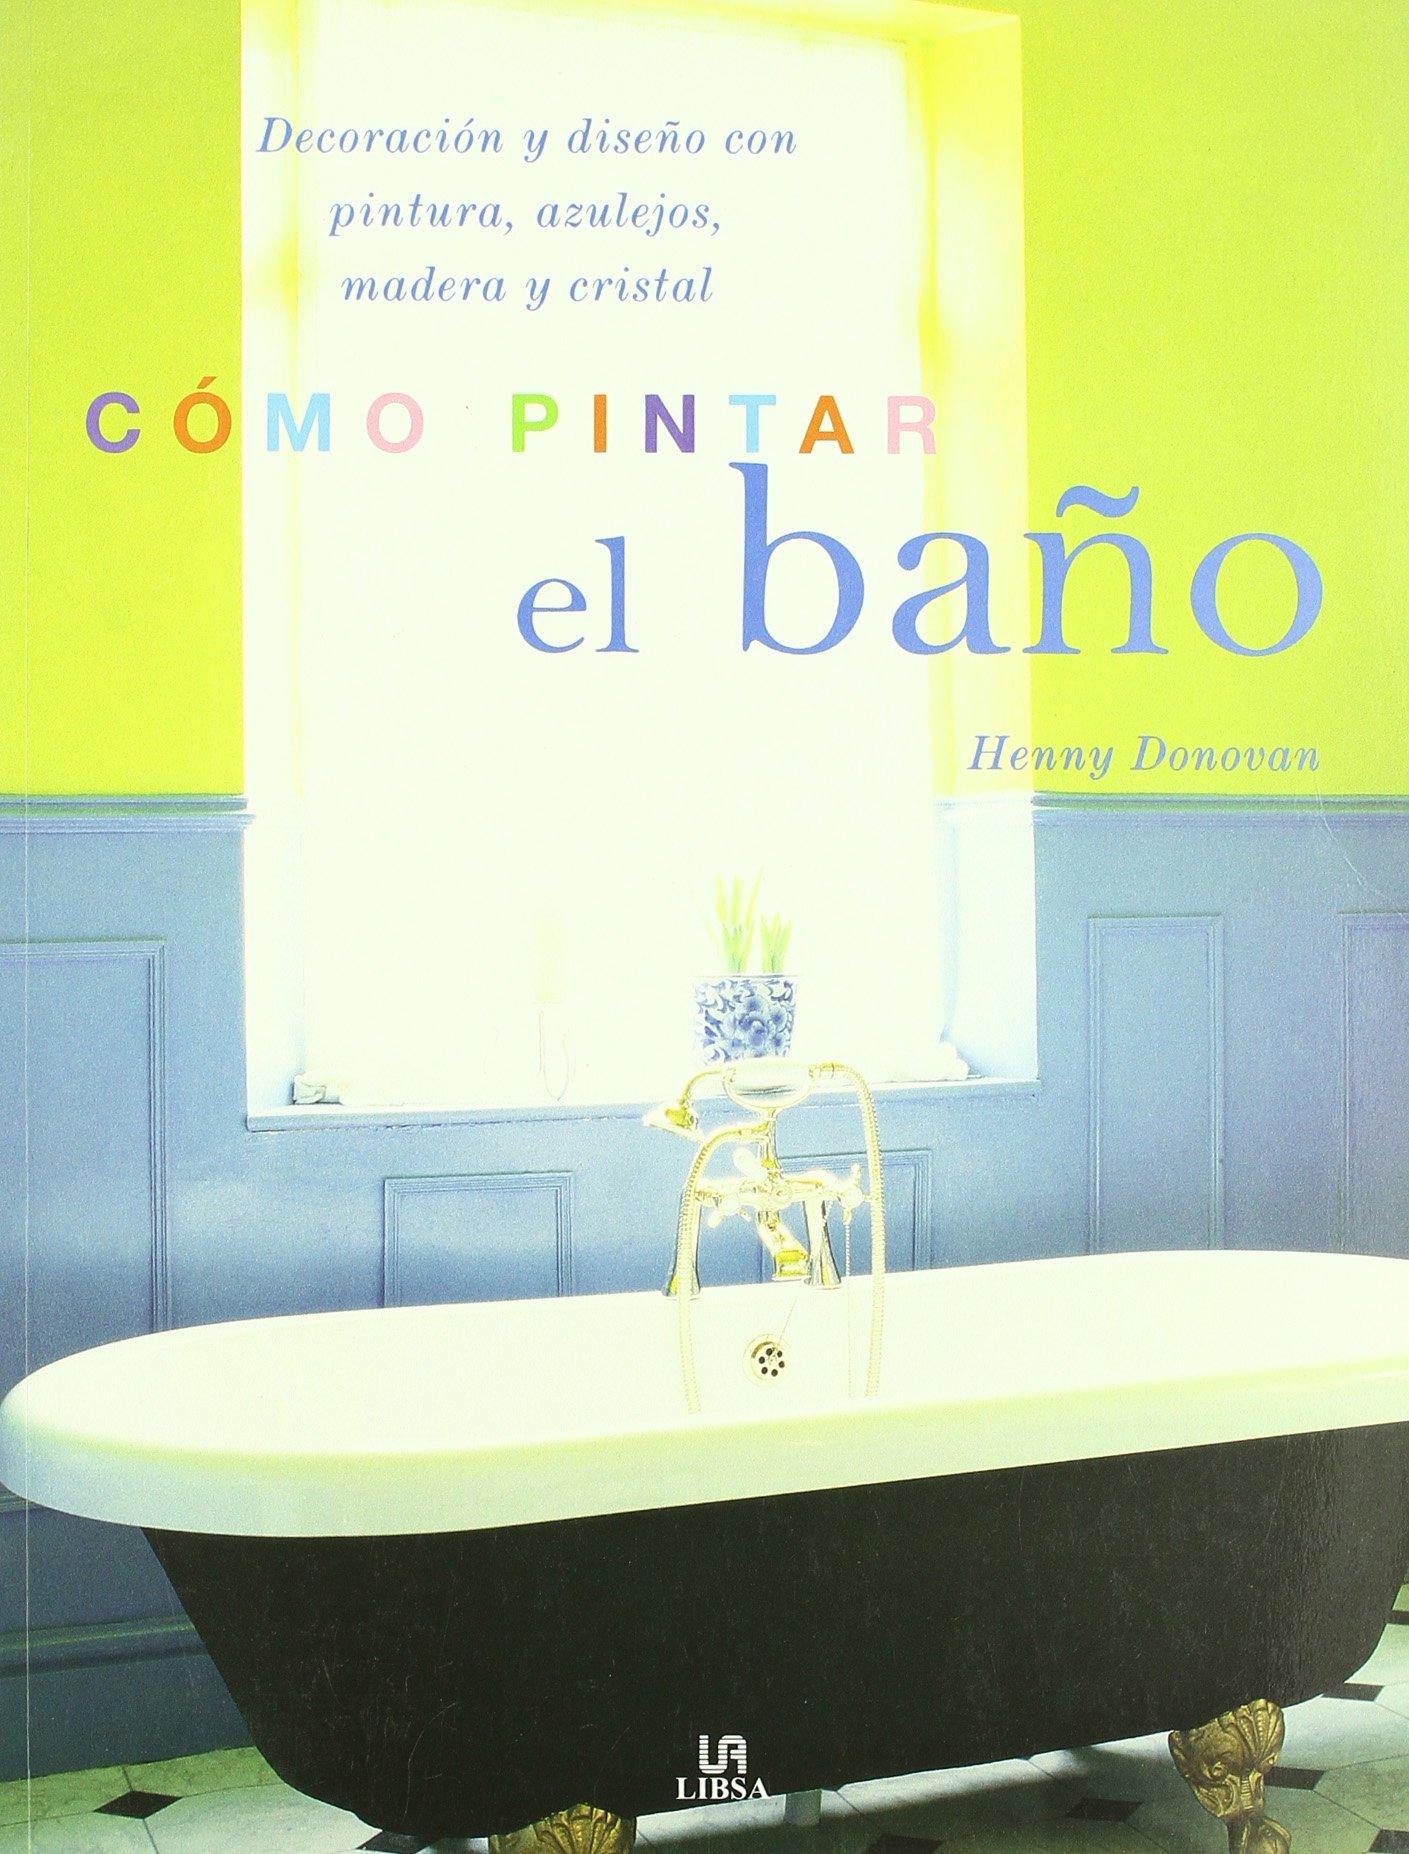 Como pintar el bano/ The Painted Bathroom (Spanish Edition) (Spanish) Paperback – June 30, 2004